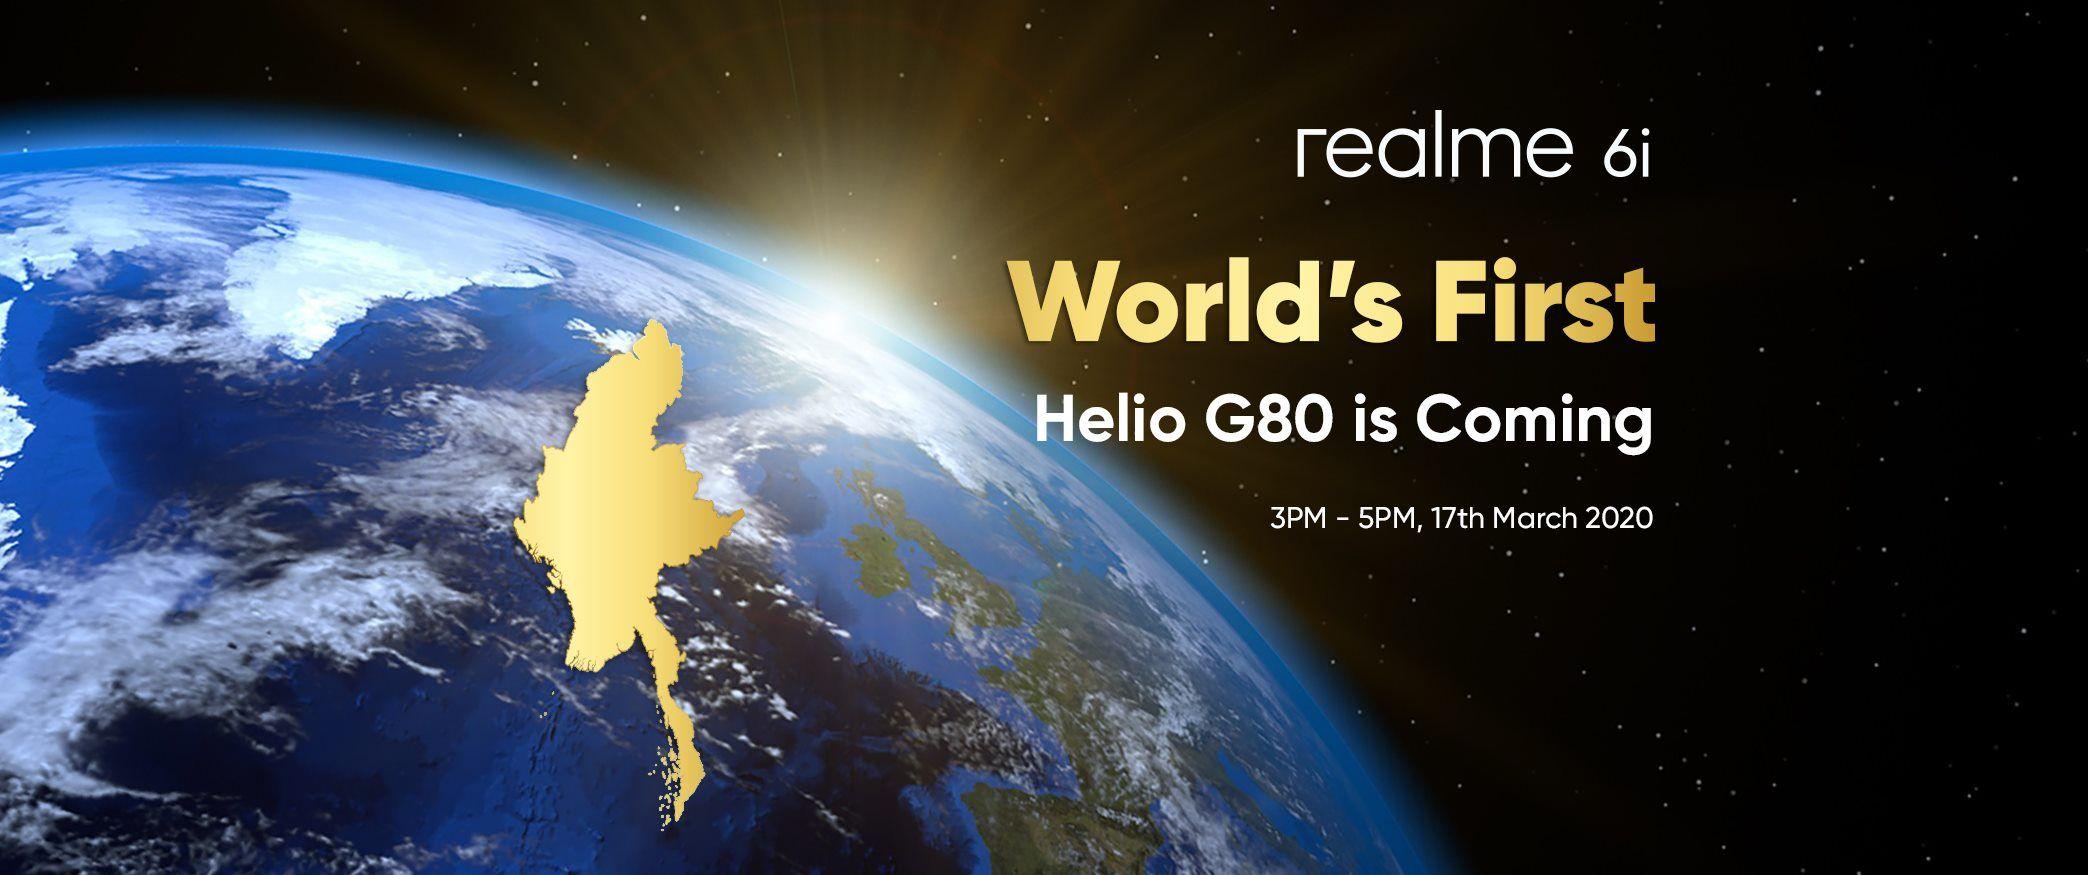 realme Myanmarがrealme 6iにMediaTek Helio G80搭載を宣言、3月17日発表予定